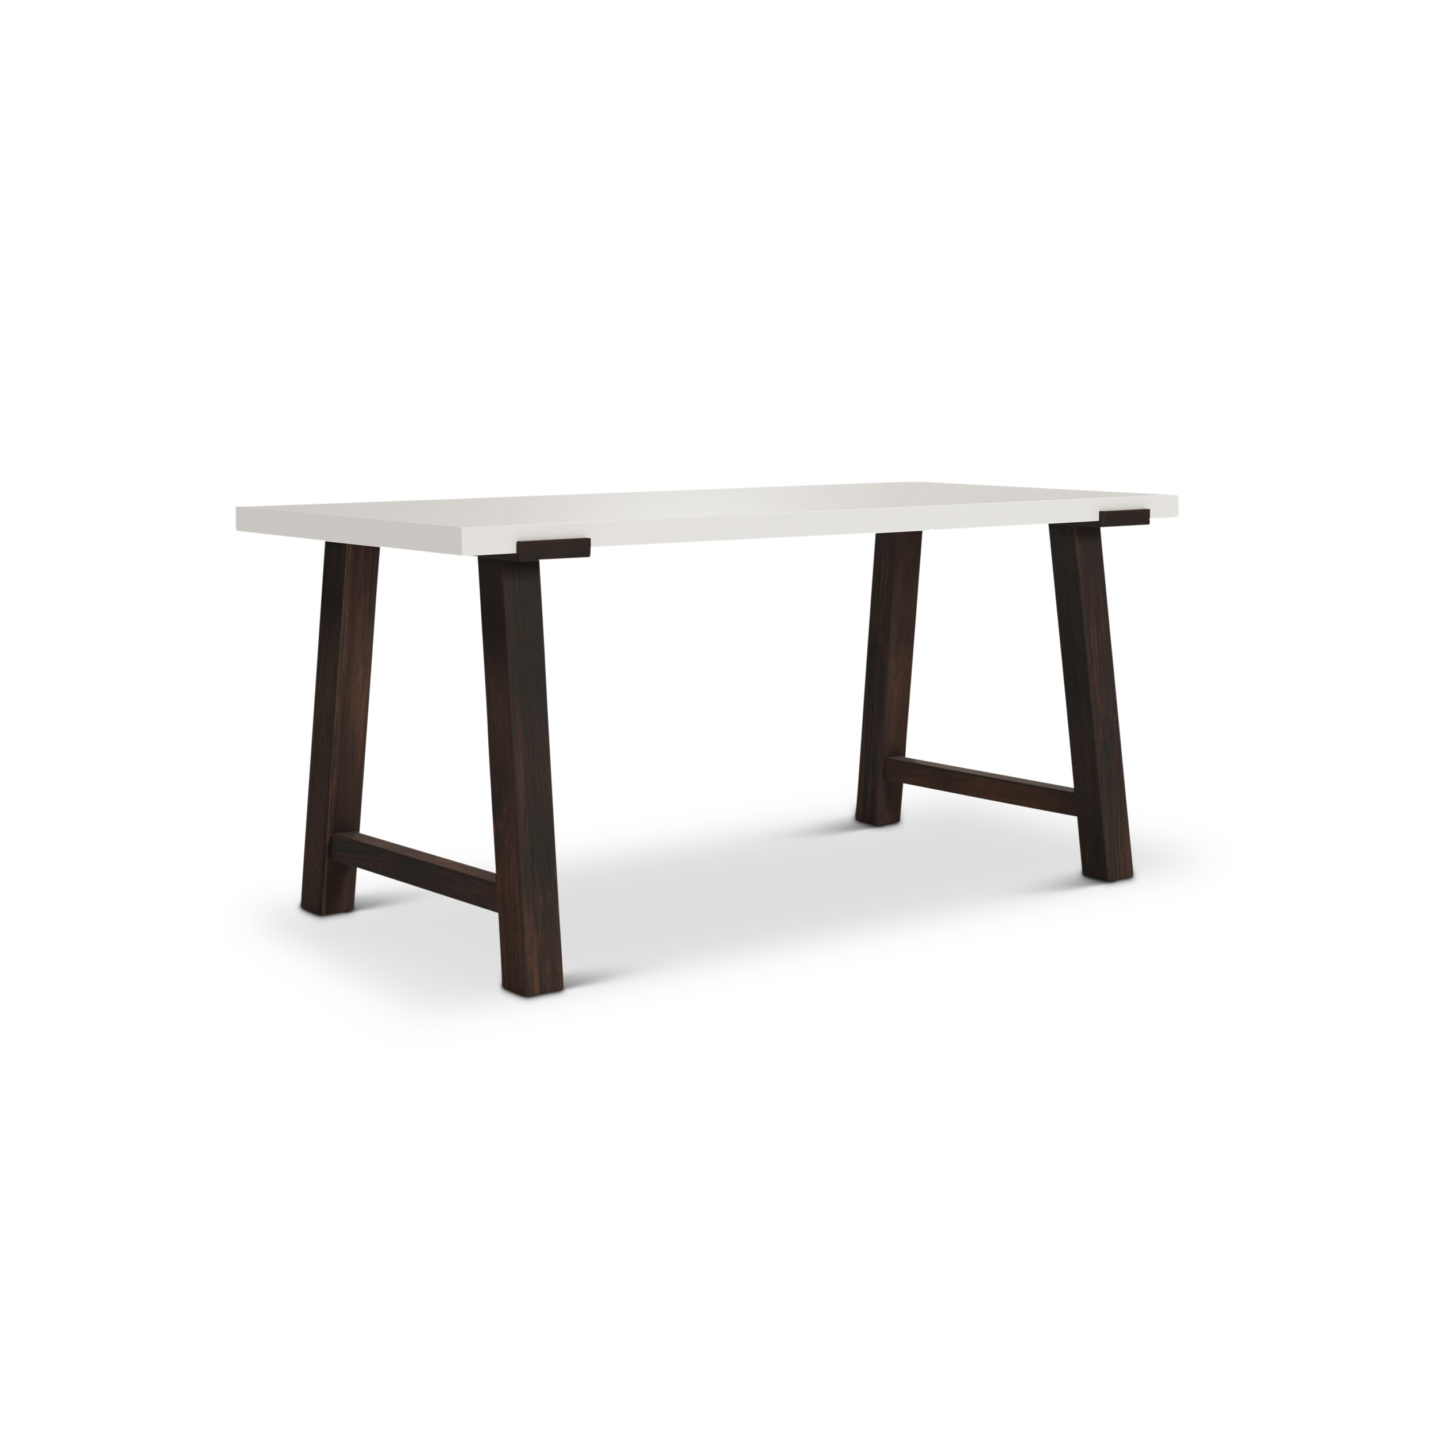 Pulten Desk with modern walnut legs